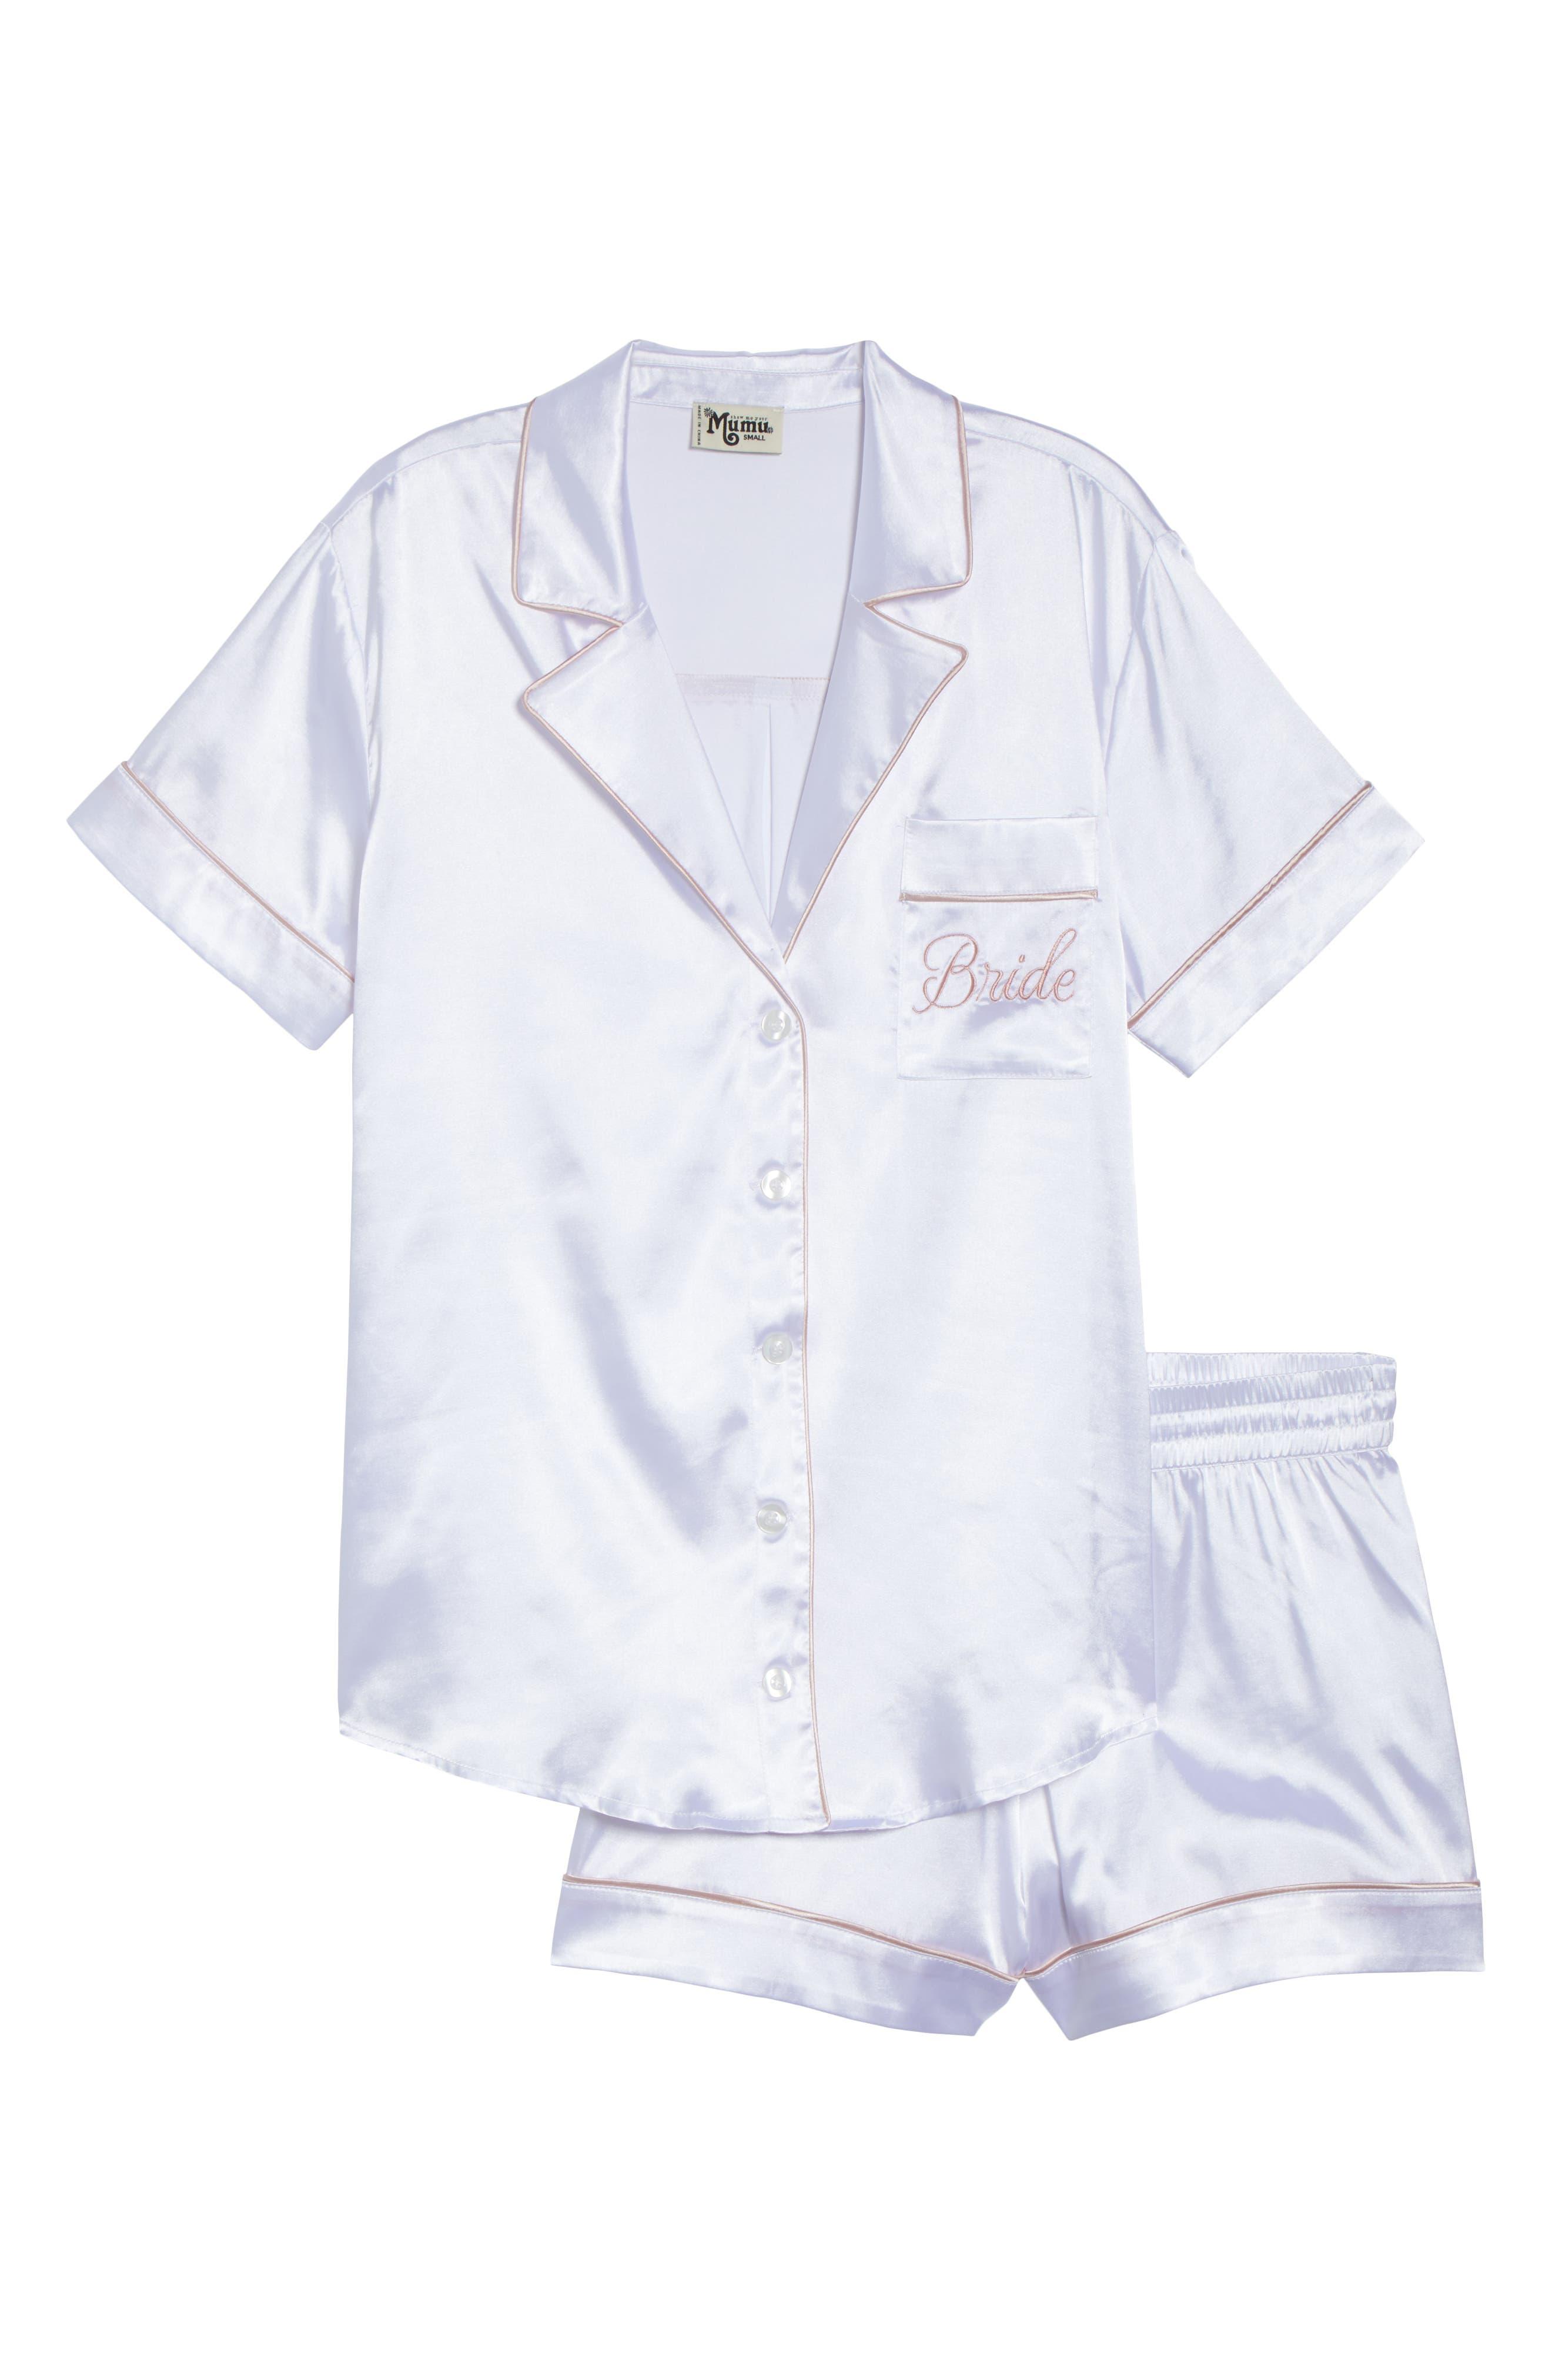 Bride Short Satin Pajamas,                             Alternate thumbnail 6, color,                             100